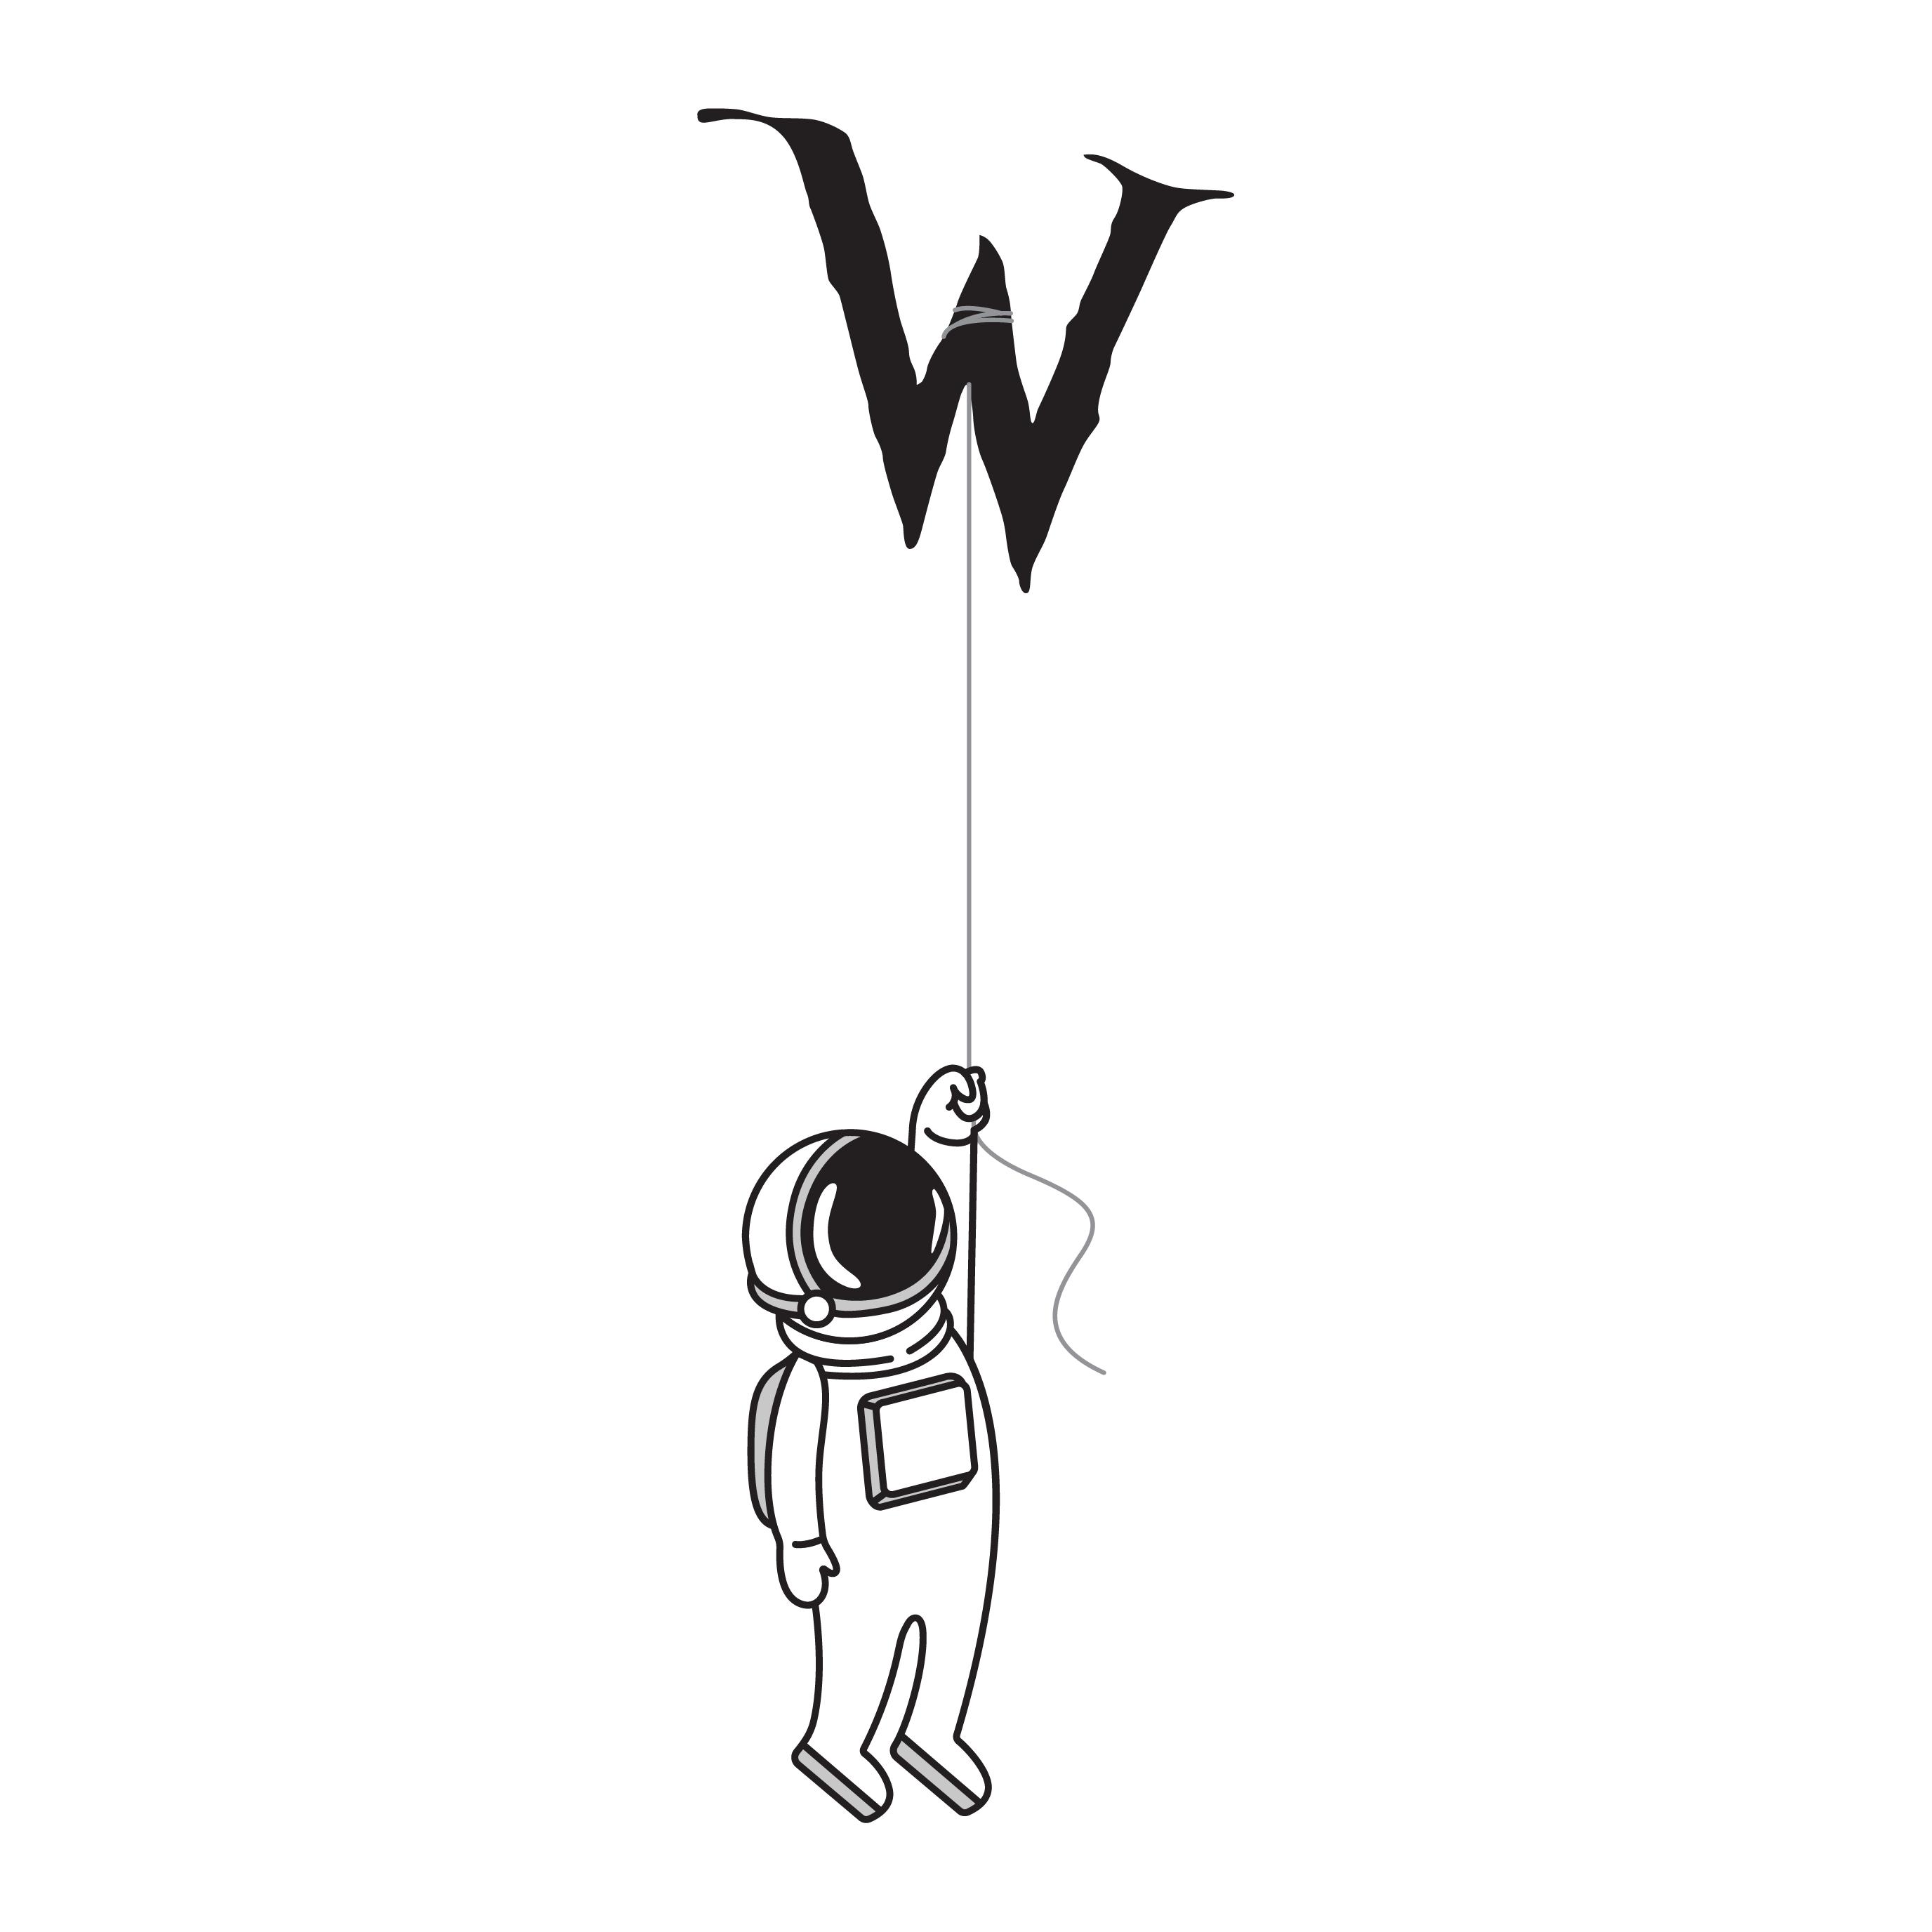 Wanderland Agency